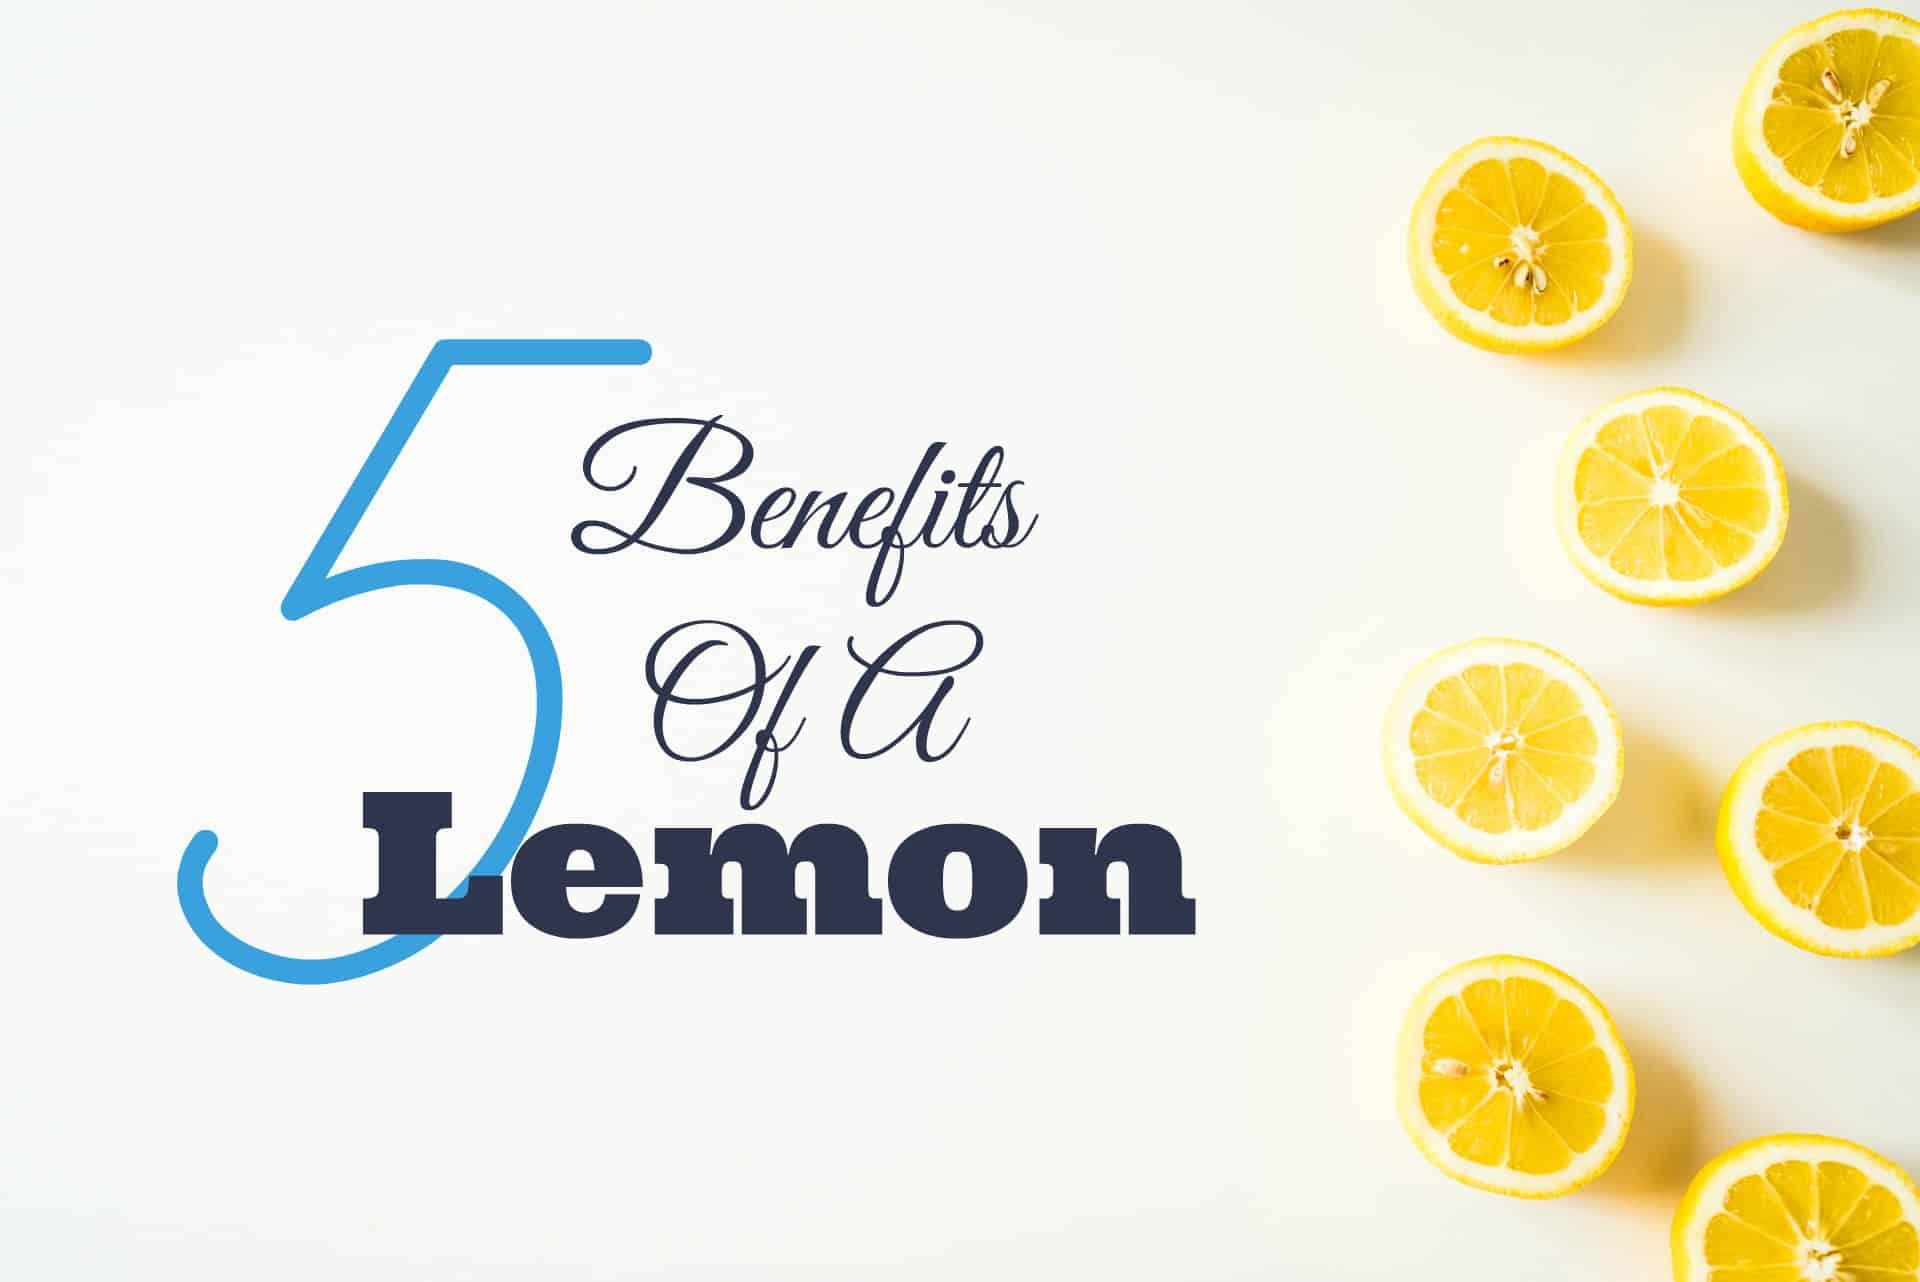 The 5 Benefits Of A Lemon